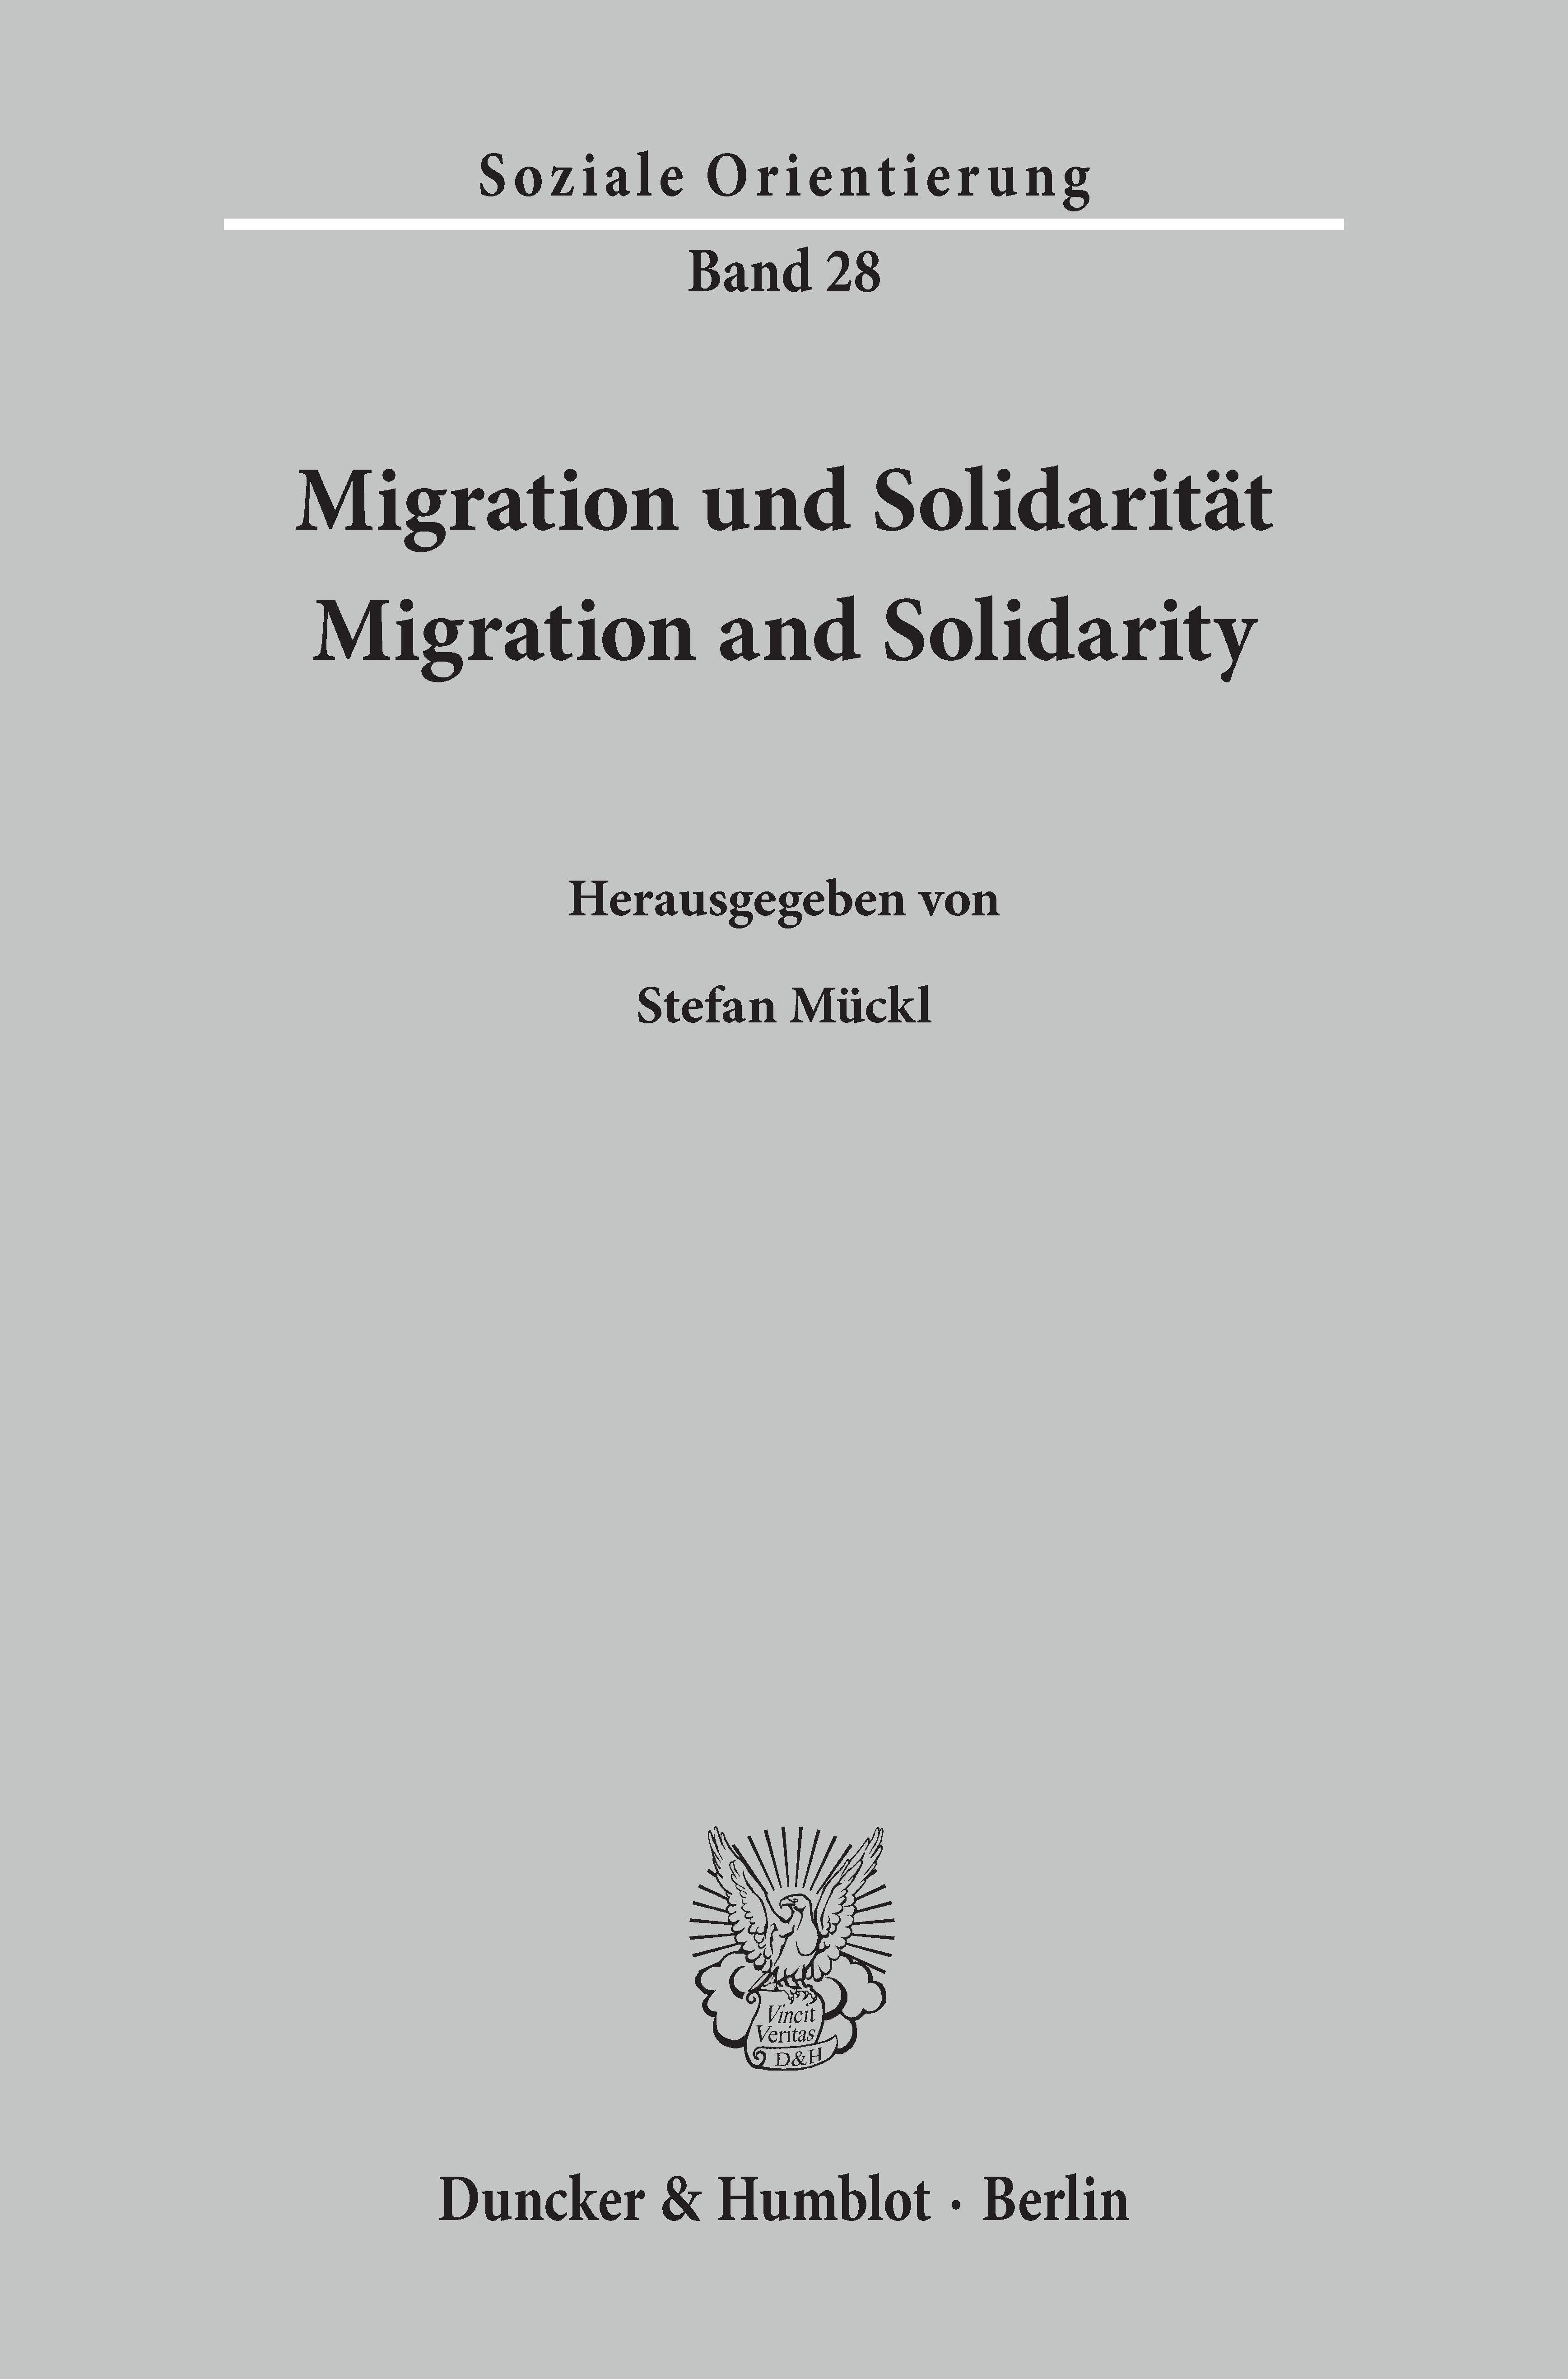 Migration und Solidarität / Migration and Solidarity